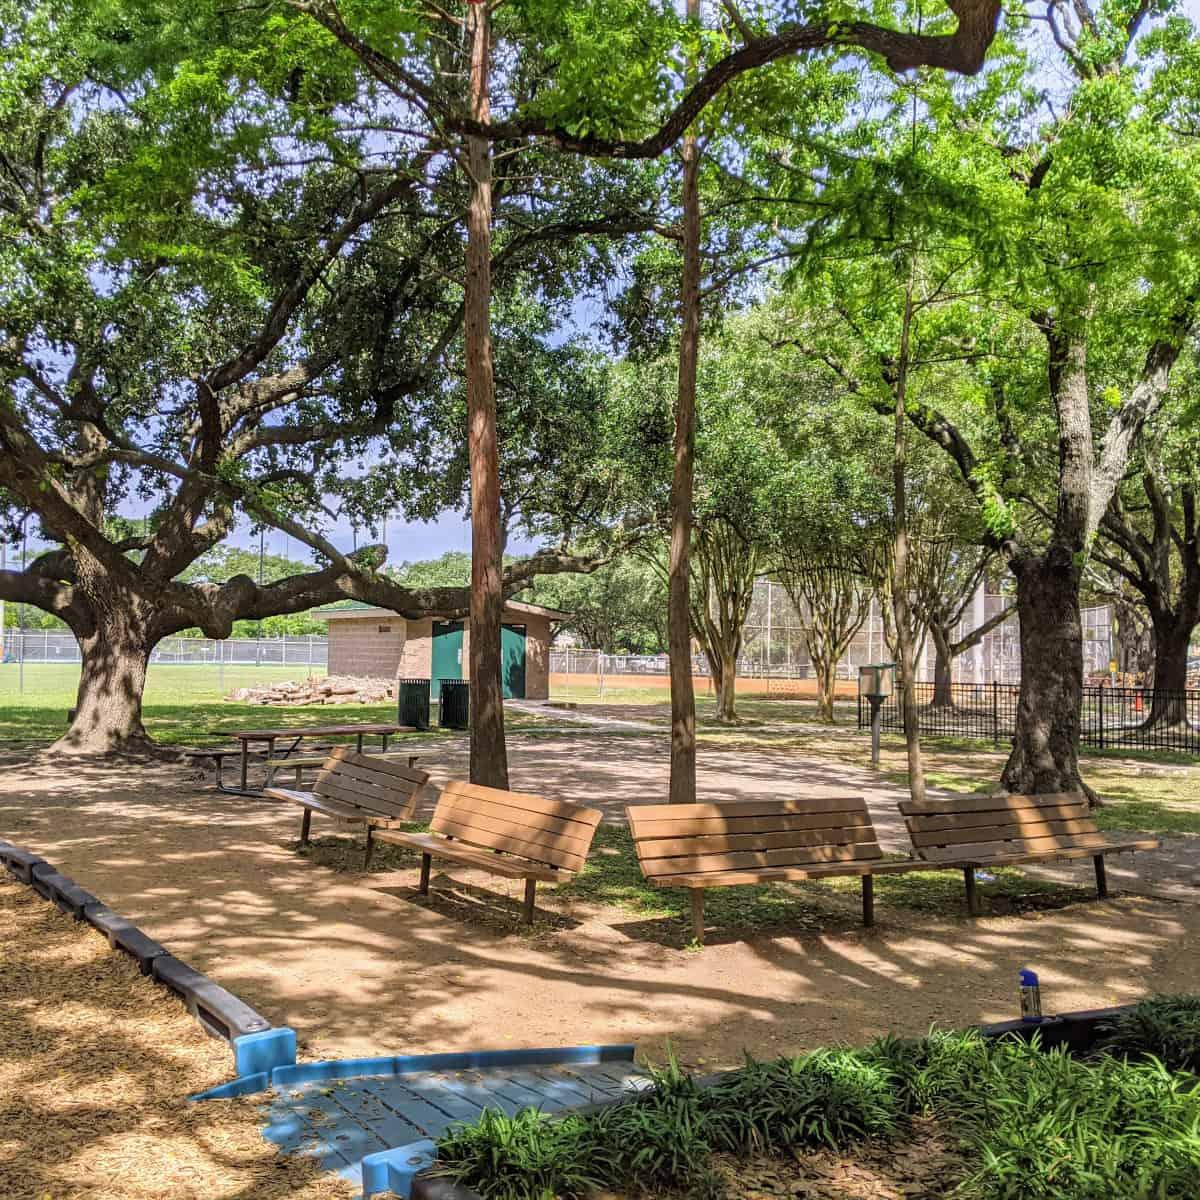 Feld Park Benches